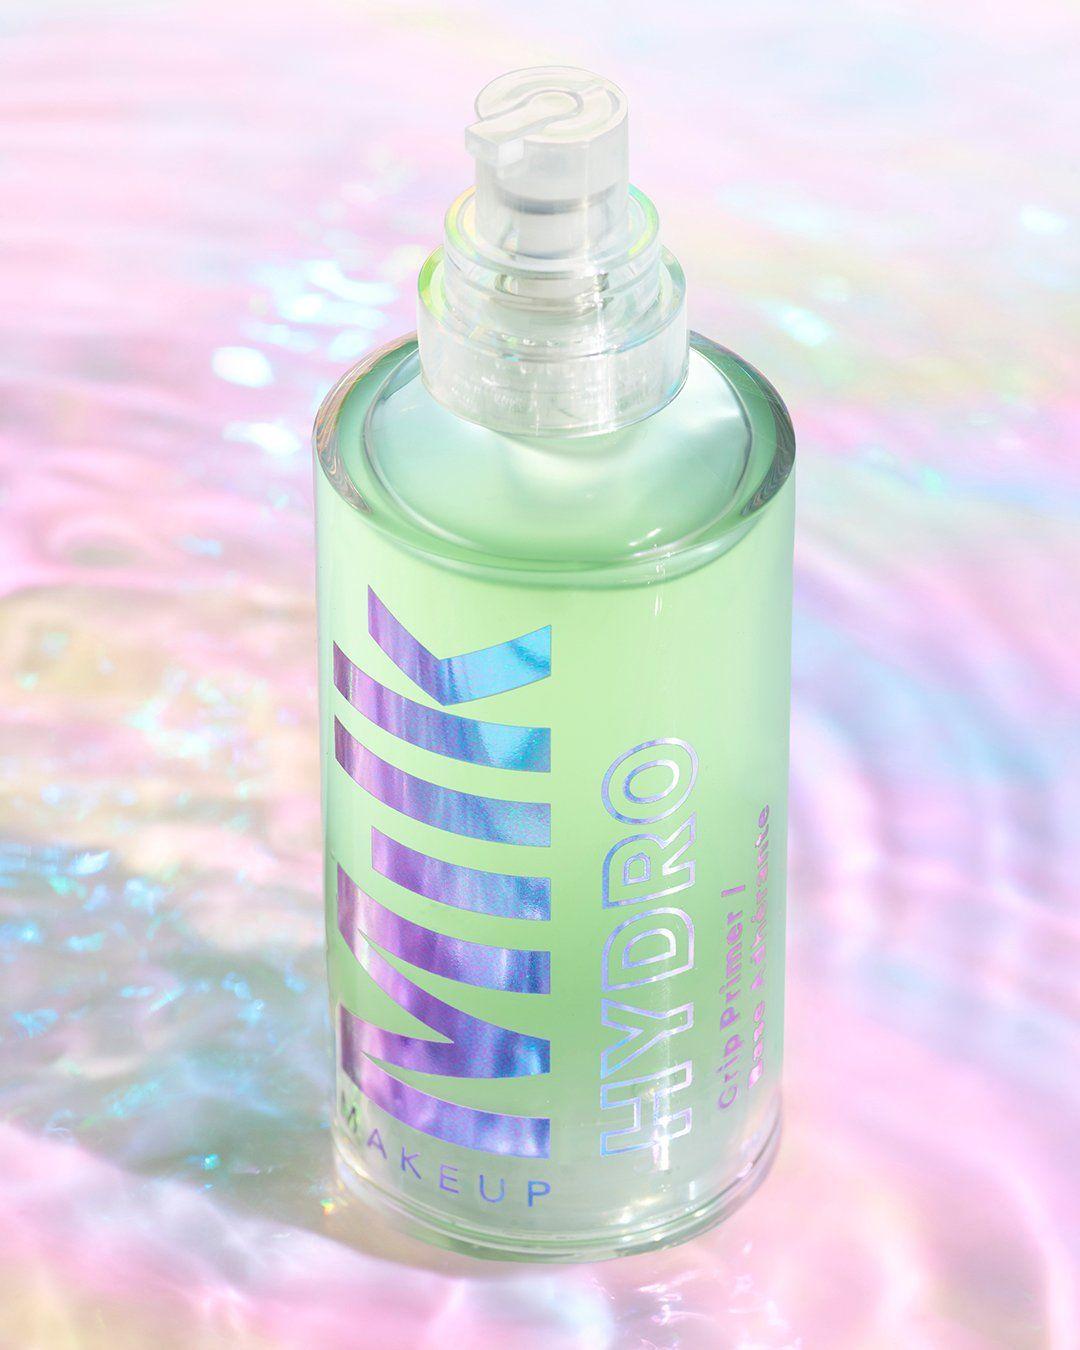 Milk Makeup Hydro Grip Gripping Primer   Sephora   Milk makeup sephora,  Milk makeup, Hydrating makeup